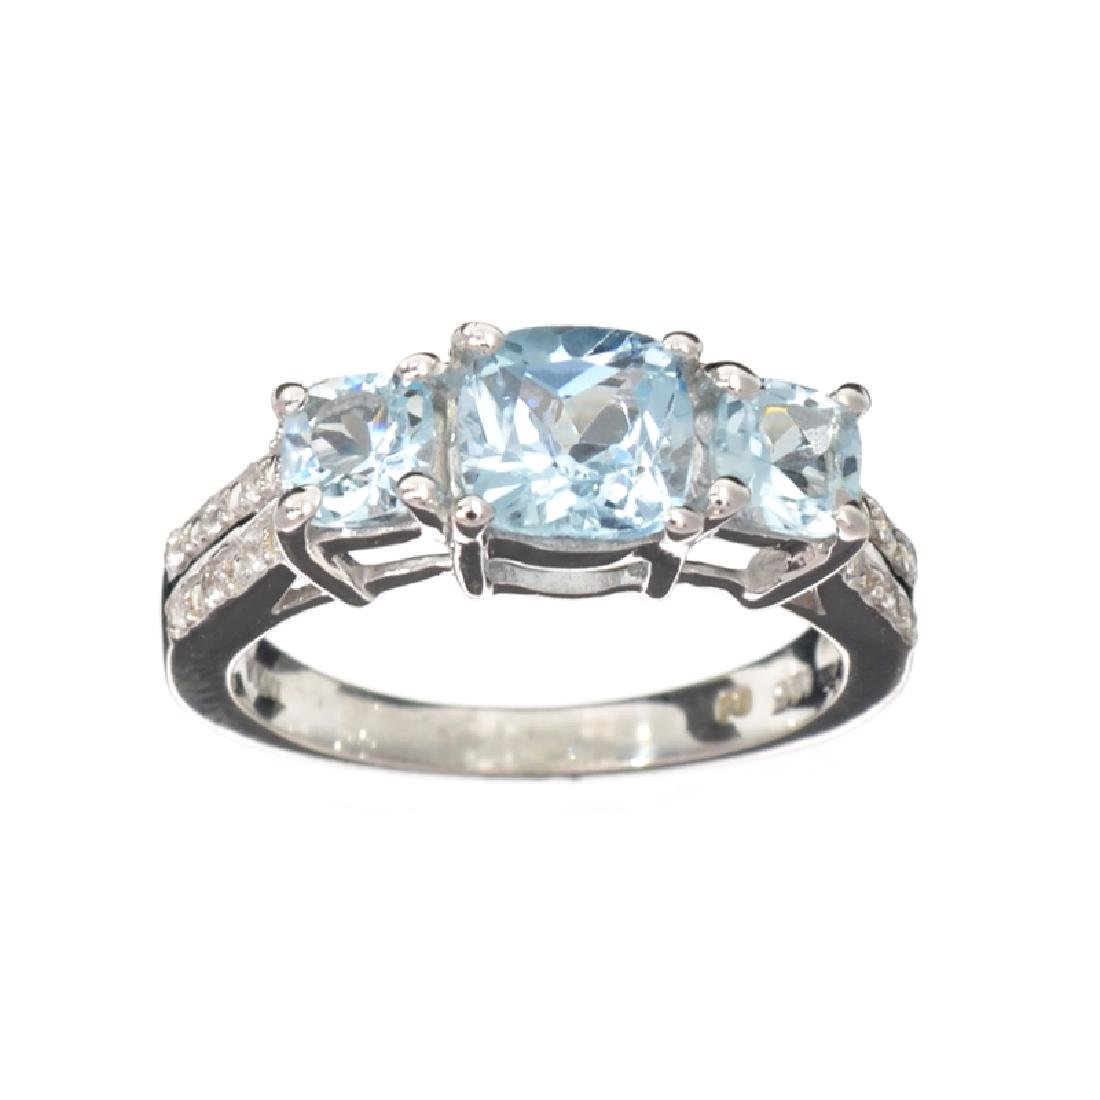 APP: 0.5k Fine Jewelry 1.82CT Topaz And White Sapphire